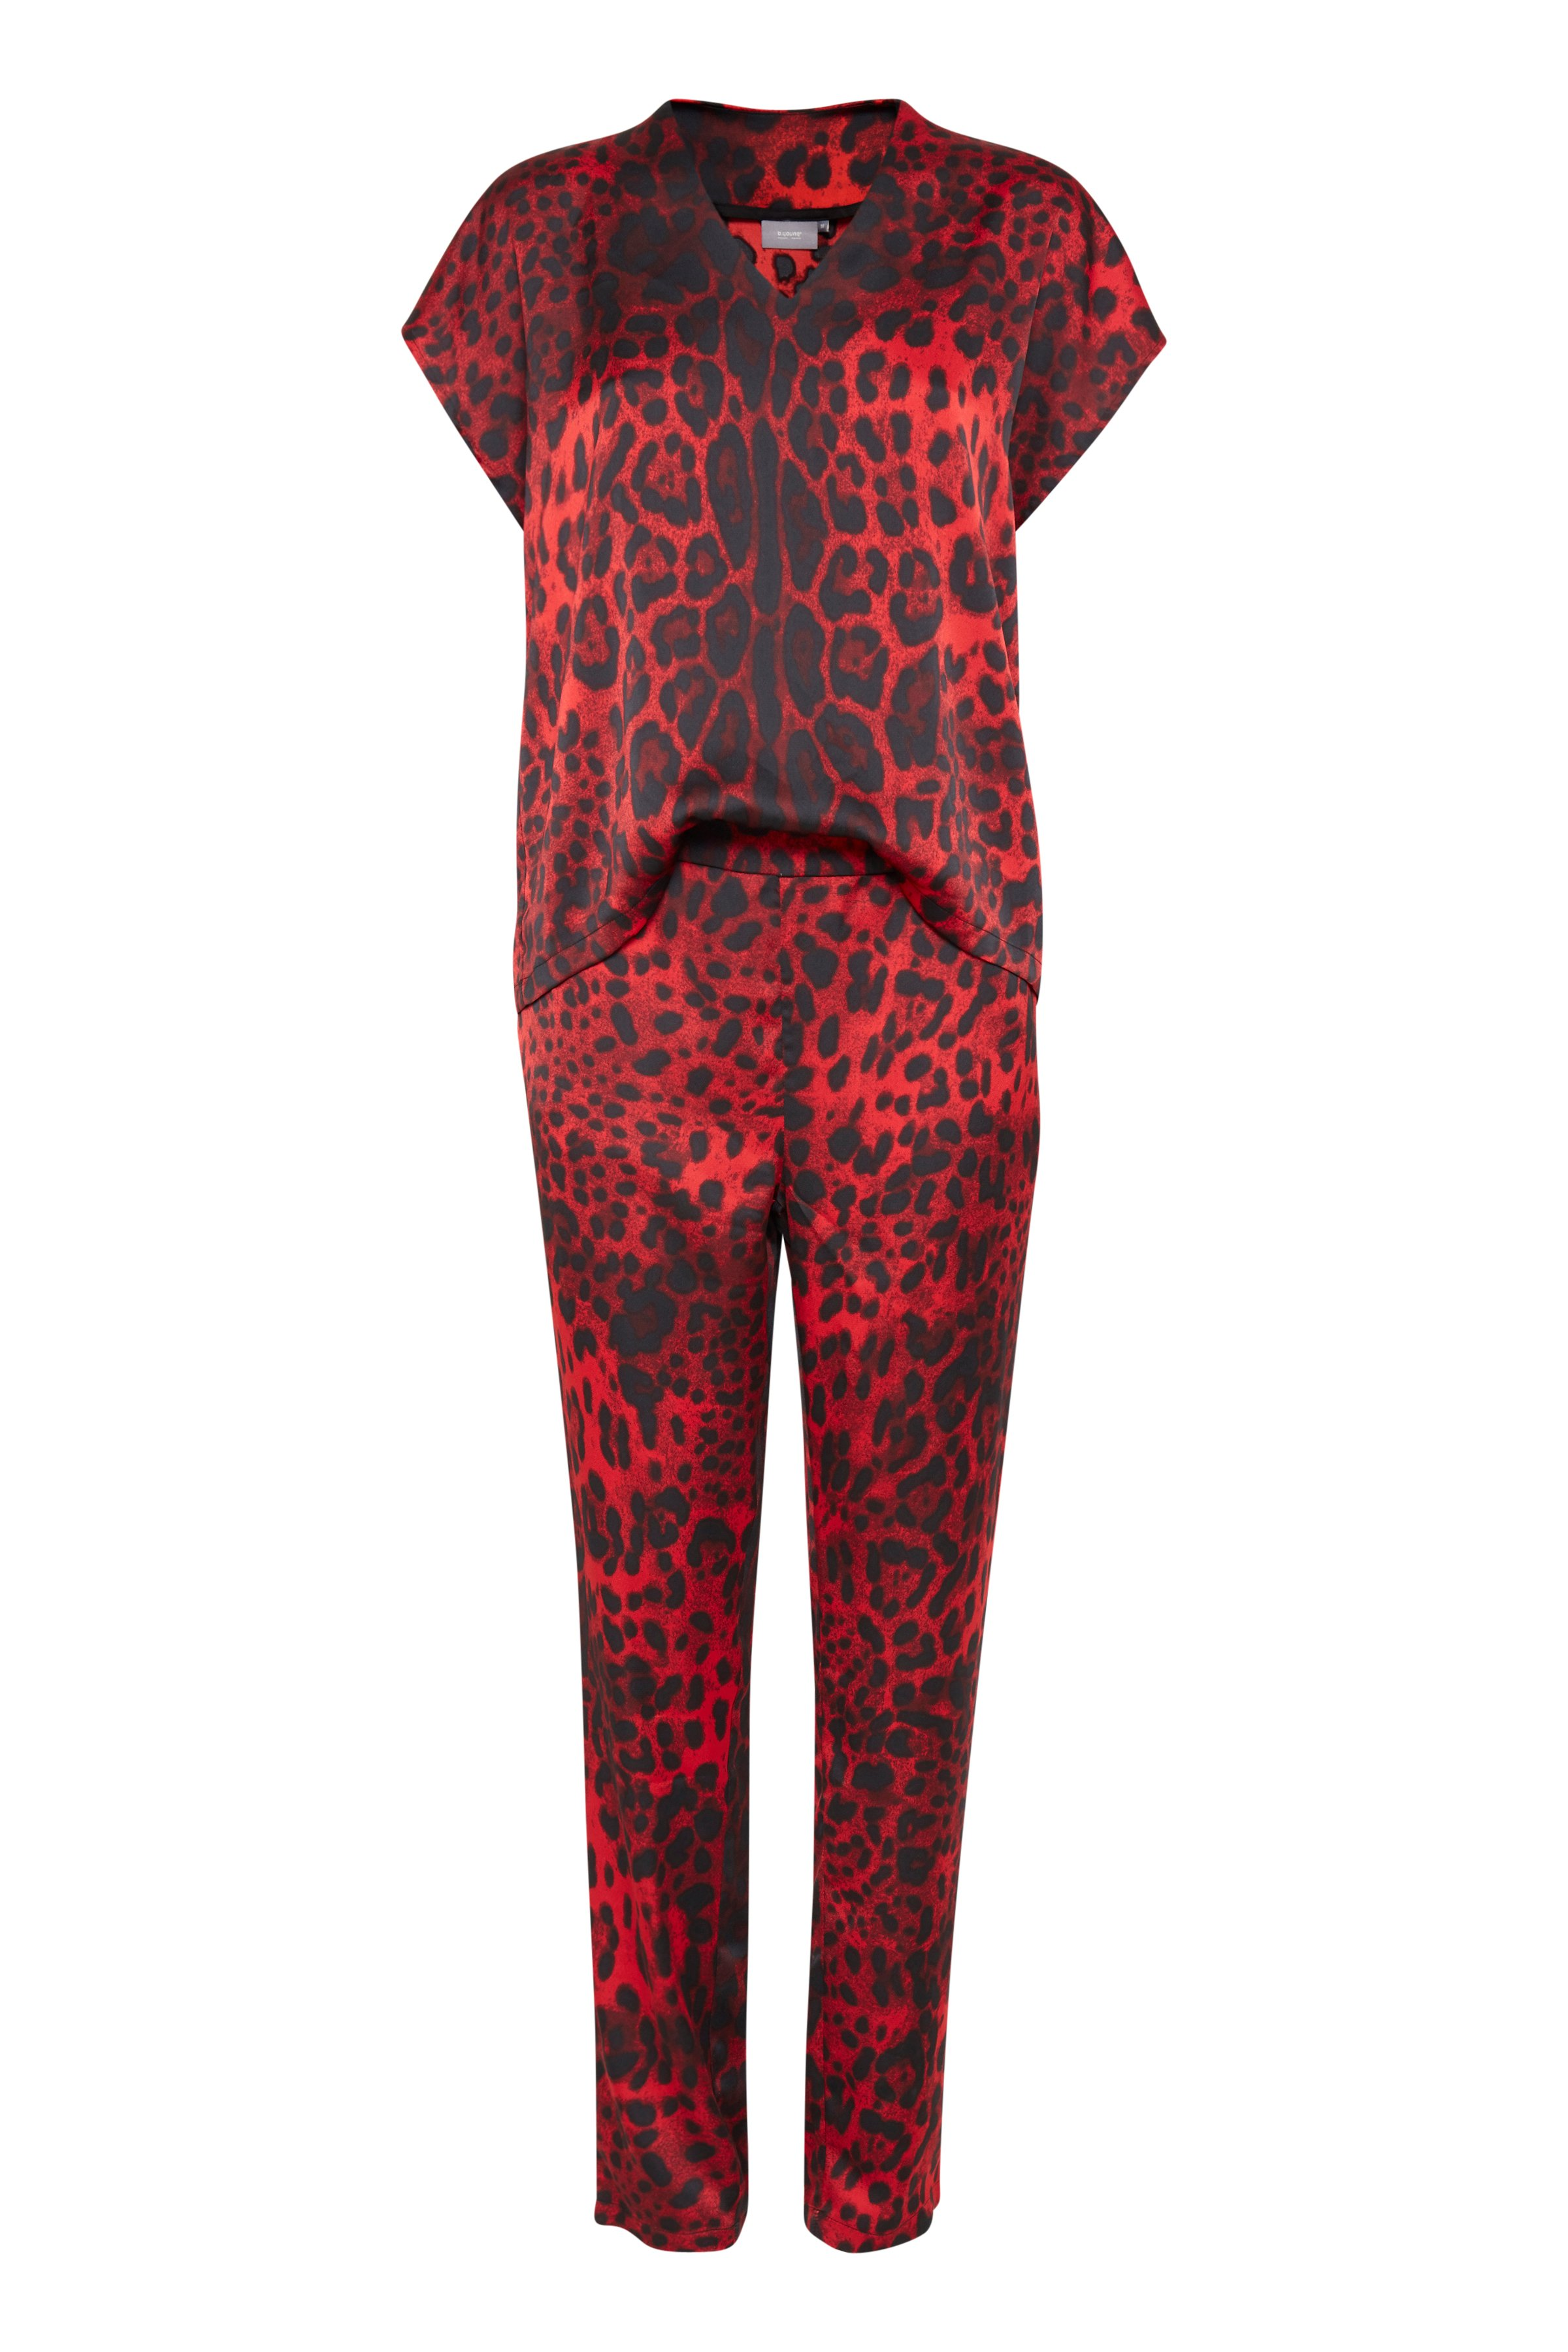 b.young Dame Letvævet jumpsuit - Rød/sort